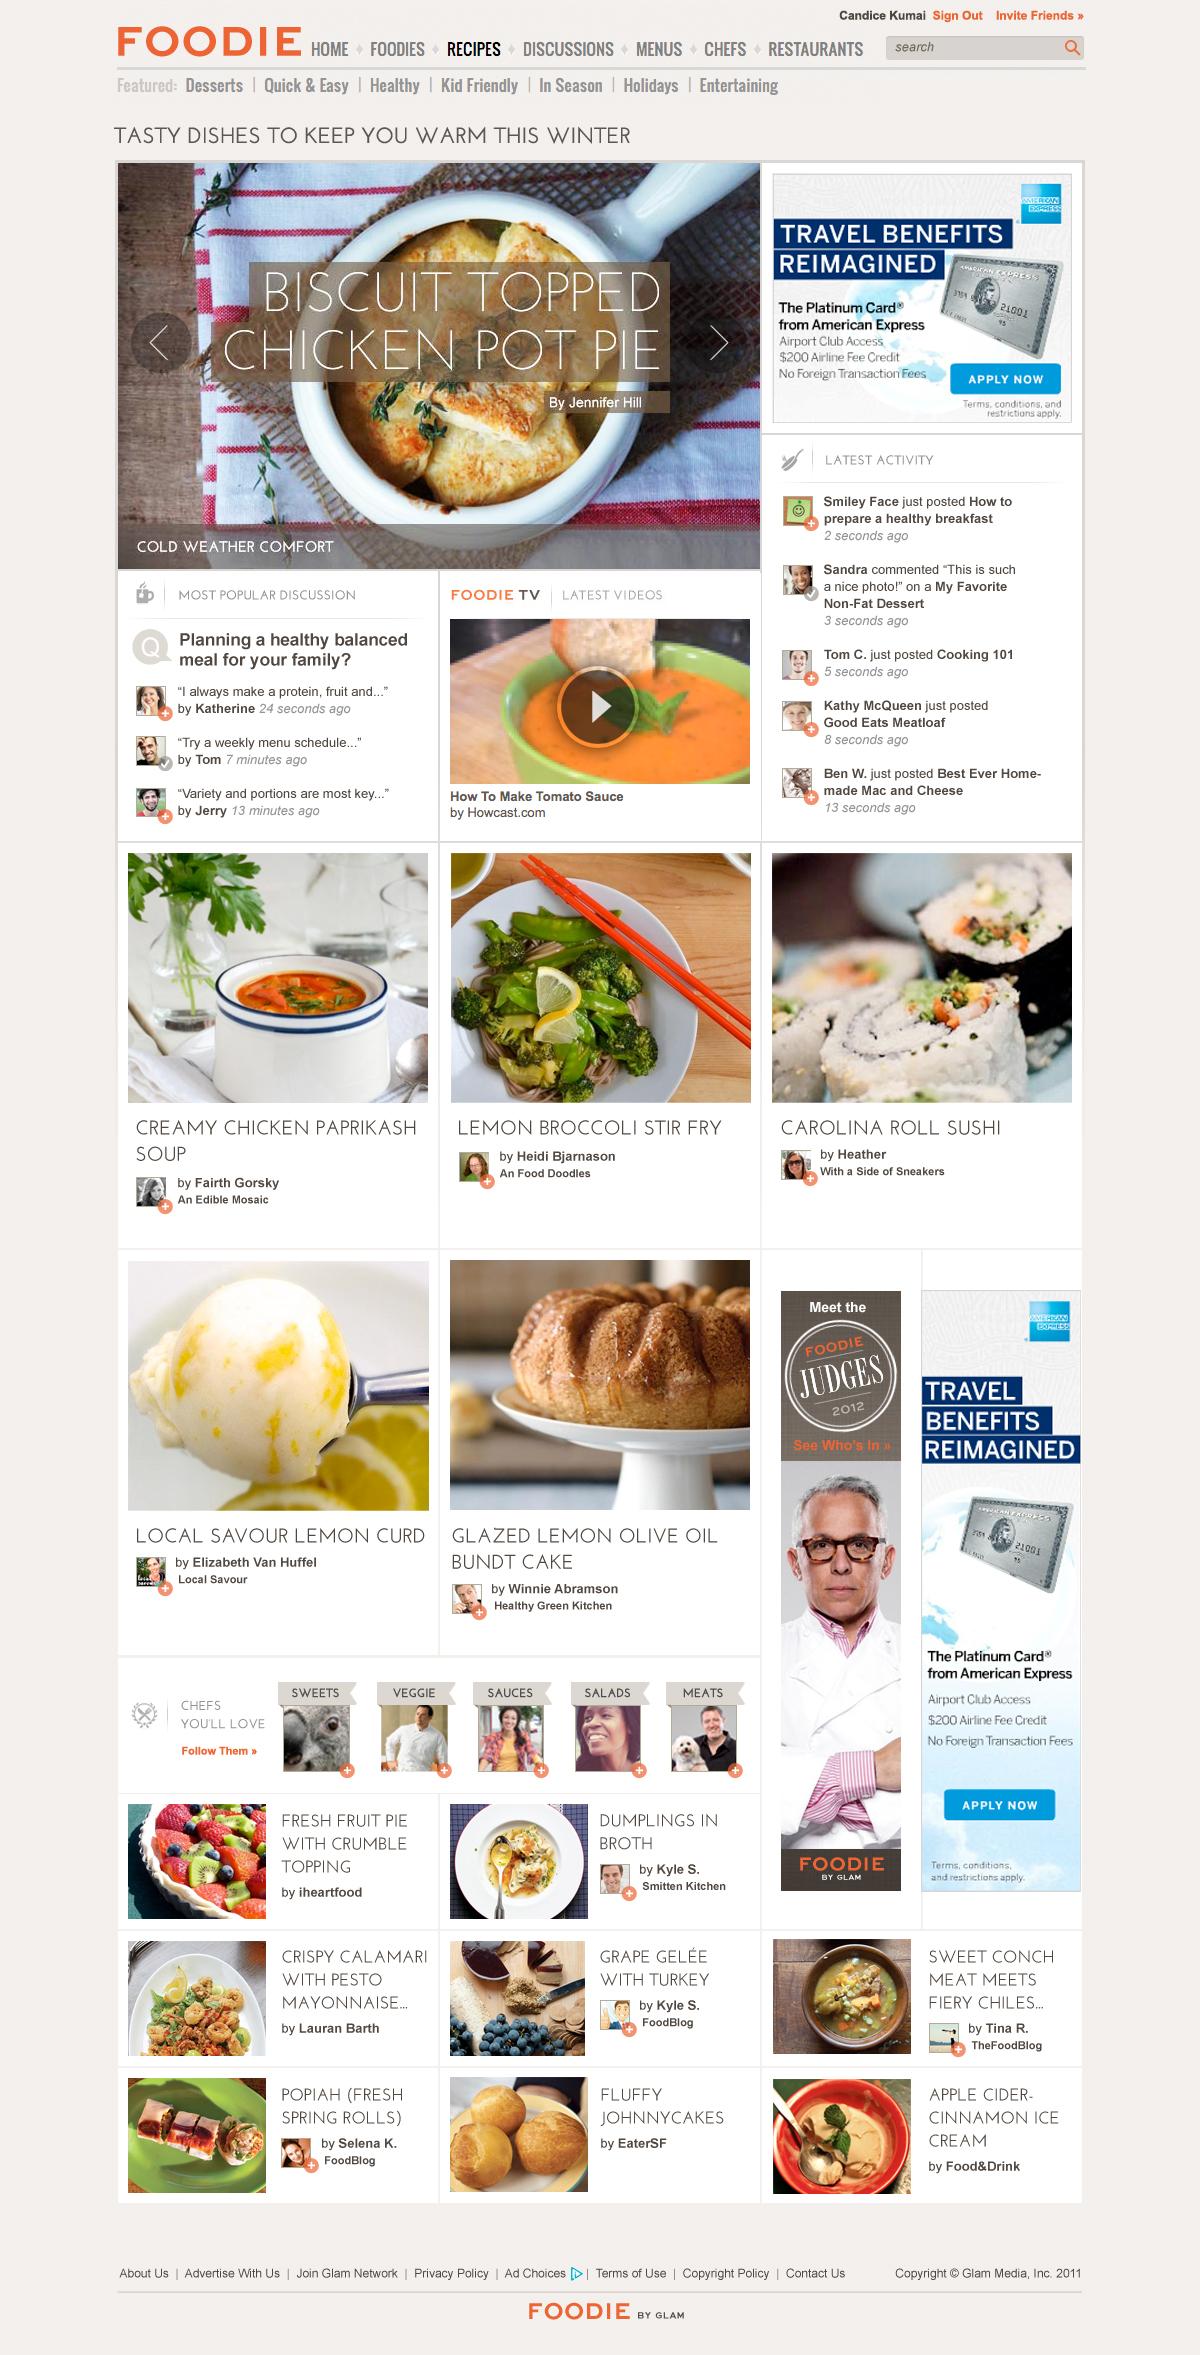 Foodie_Recipes